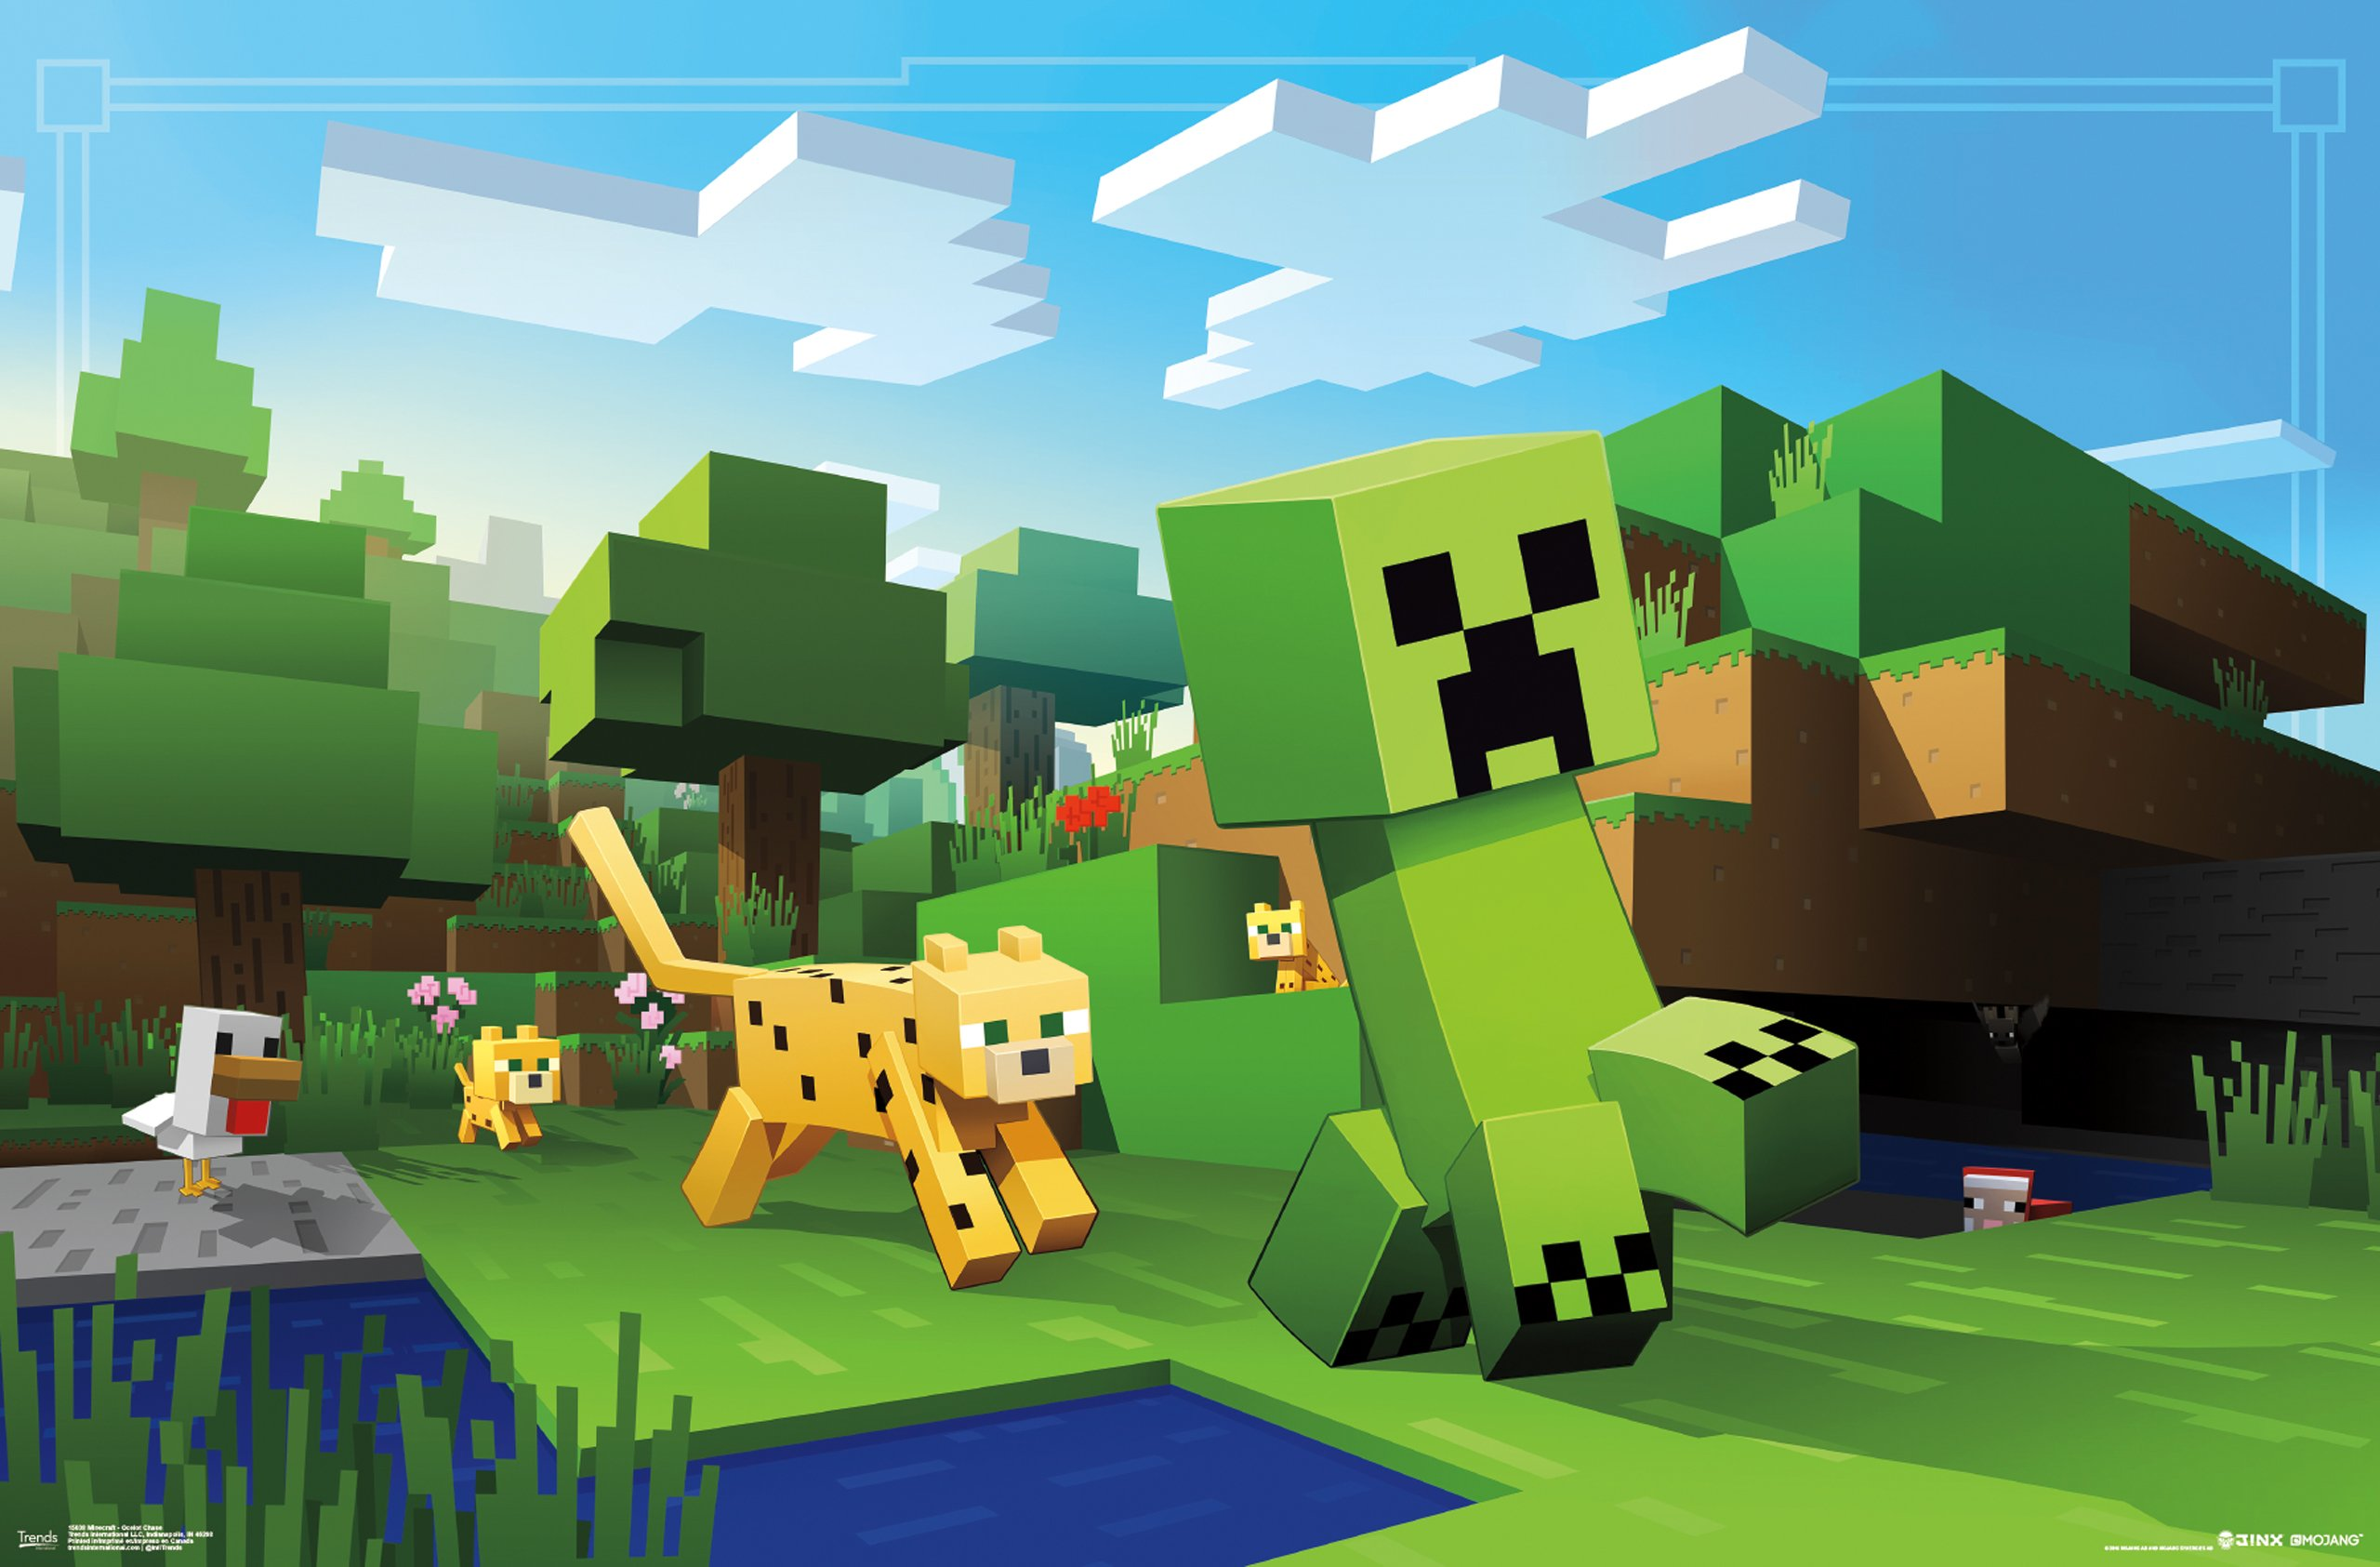 Vinilo Decorativo Pared [1k8ickcy] Minecraft